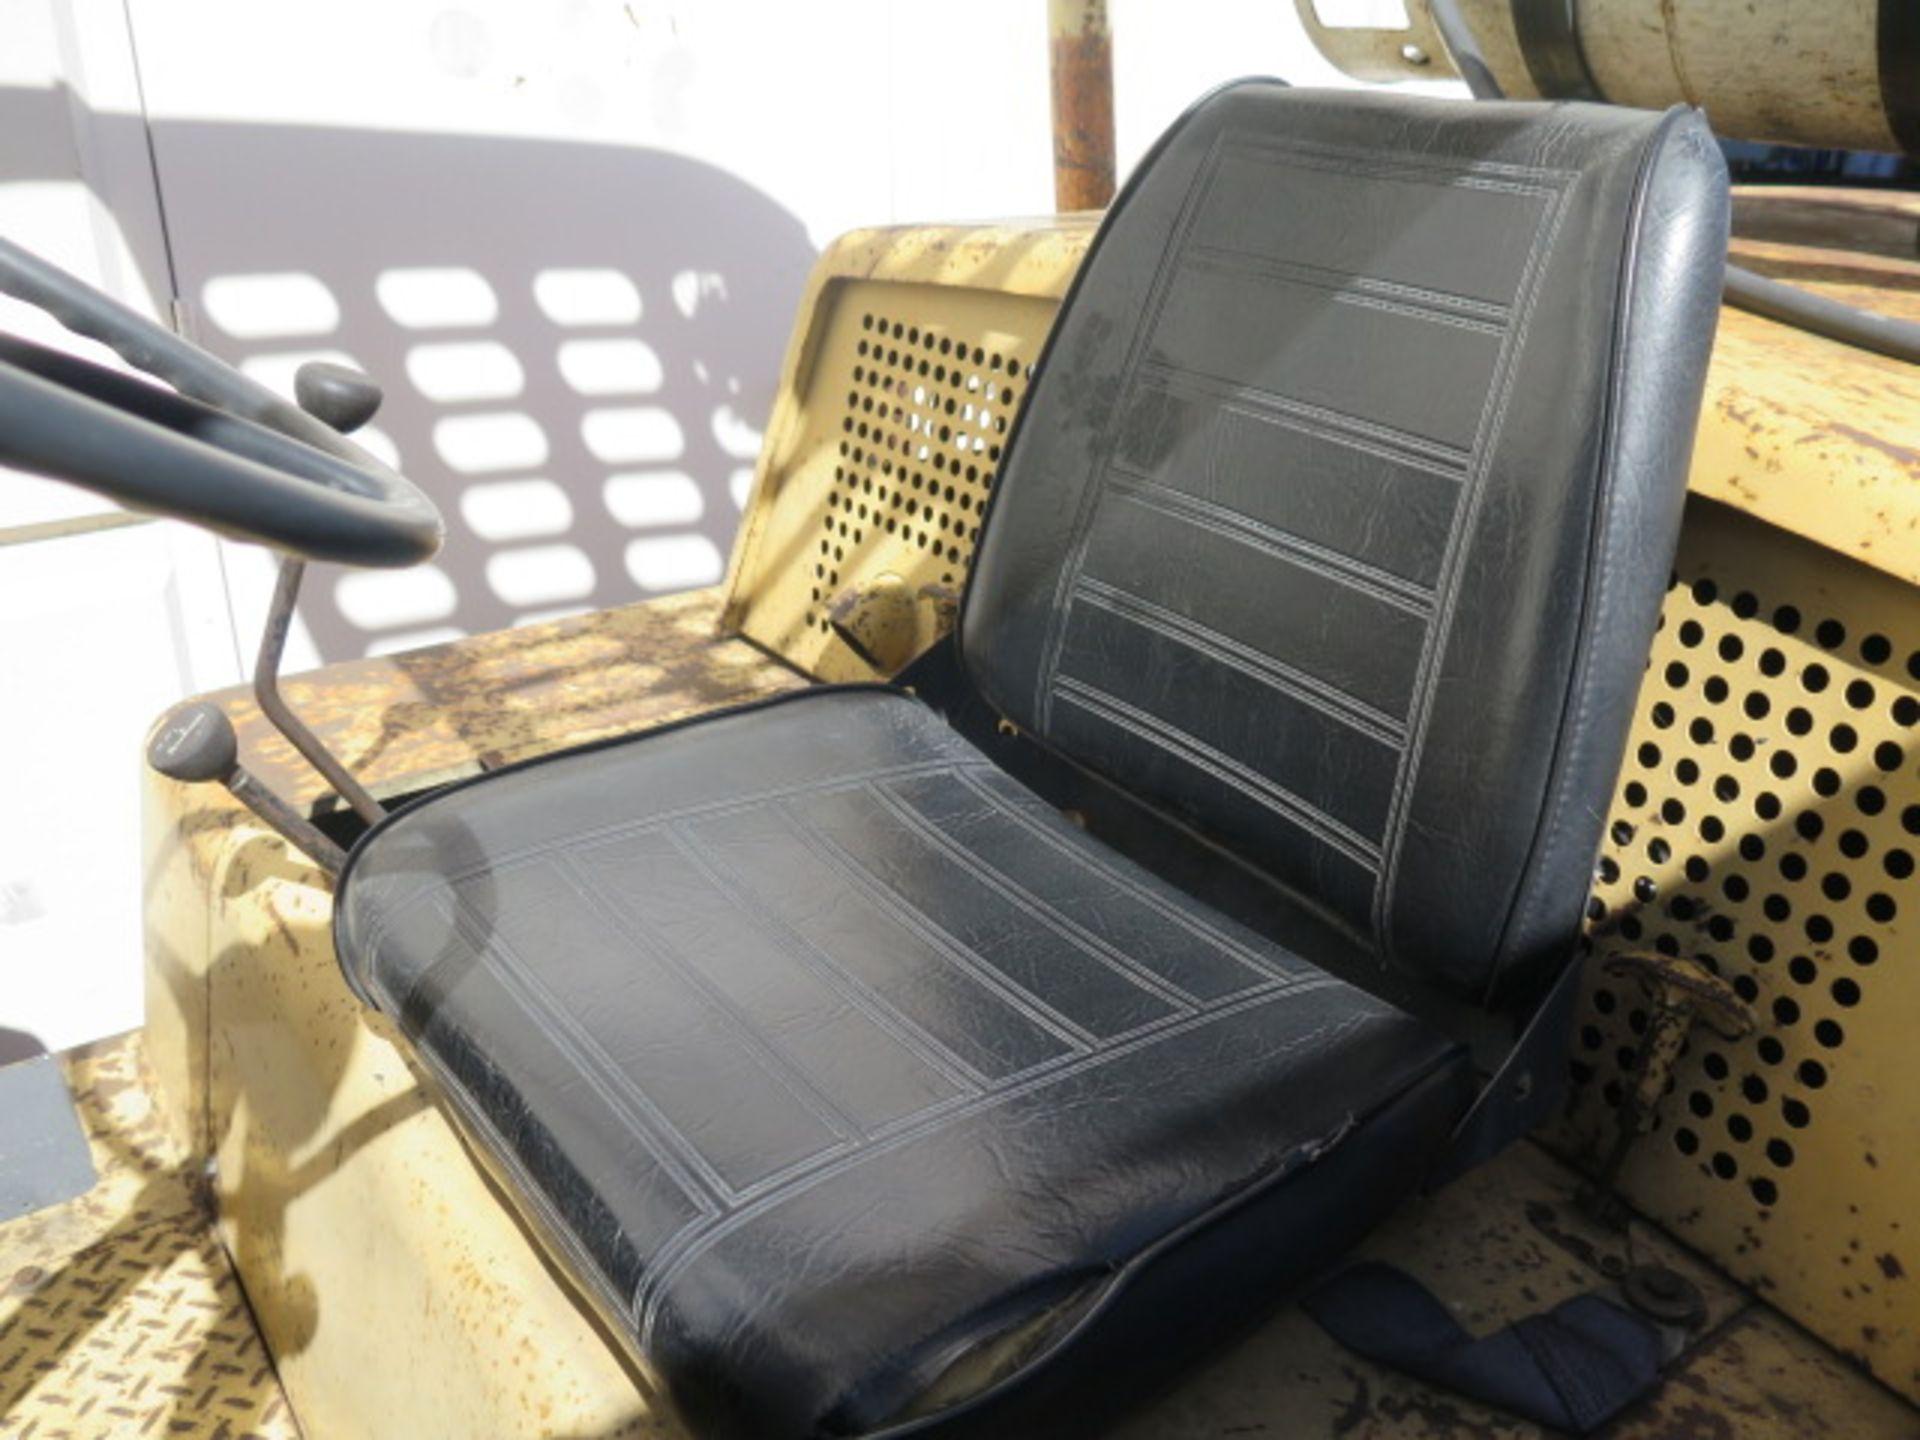 "Hyster S125A 12,500 Lb Cap LPG Forklift s/n A024DC4389A w/ 2-Stage Mast, 129"" Lift Height, 2-Speed T - Image 12 of 14"